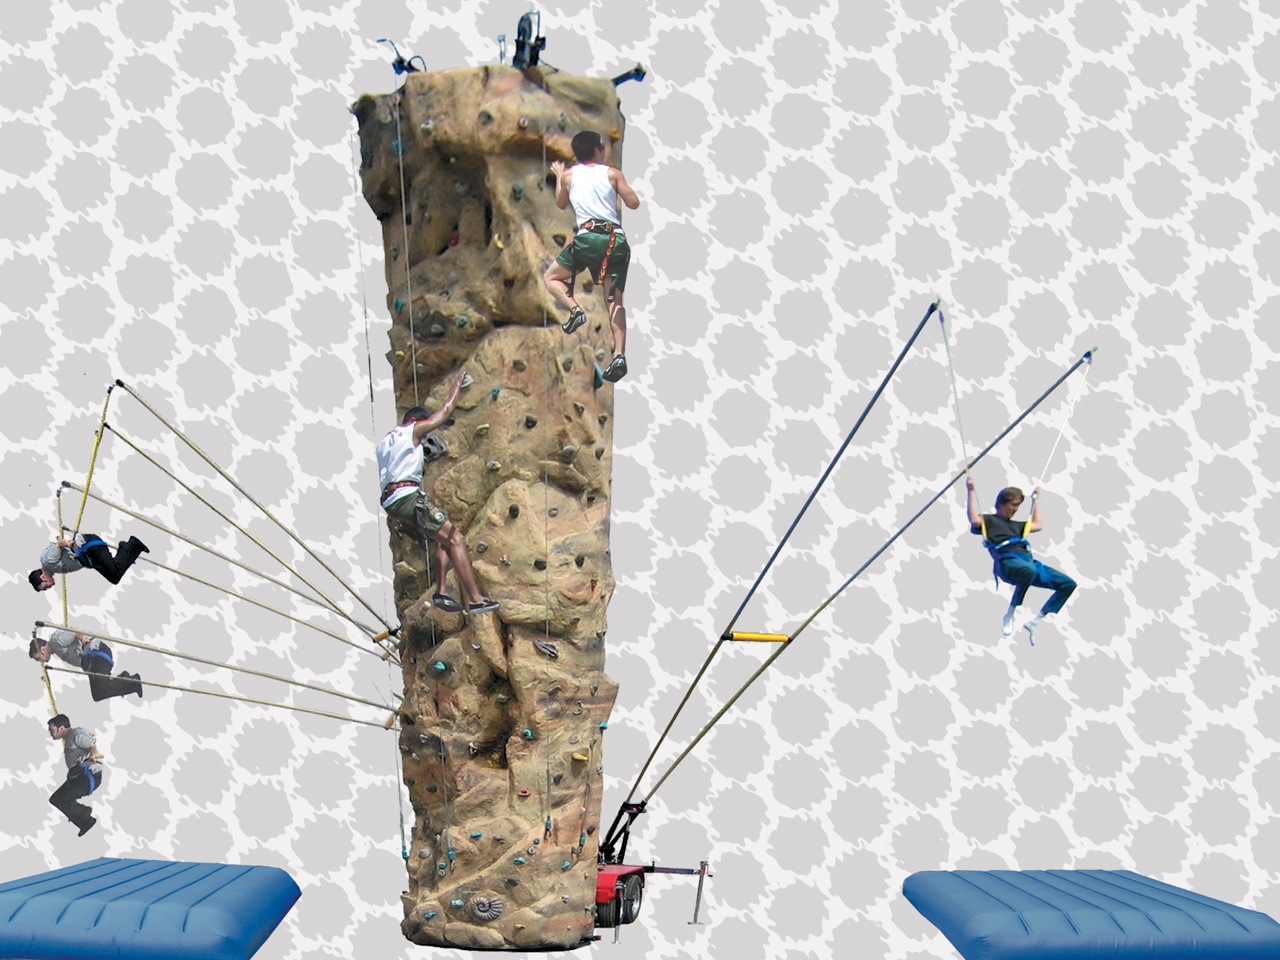 Combo Climbing Walls | Rock Climbing & Jumper System